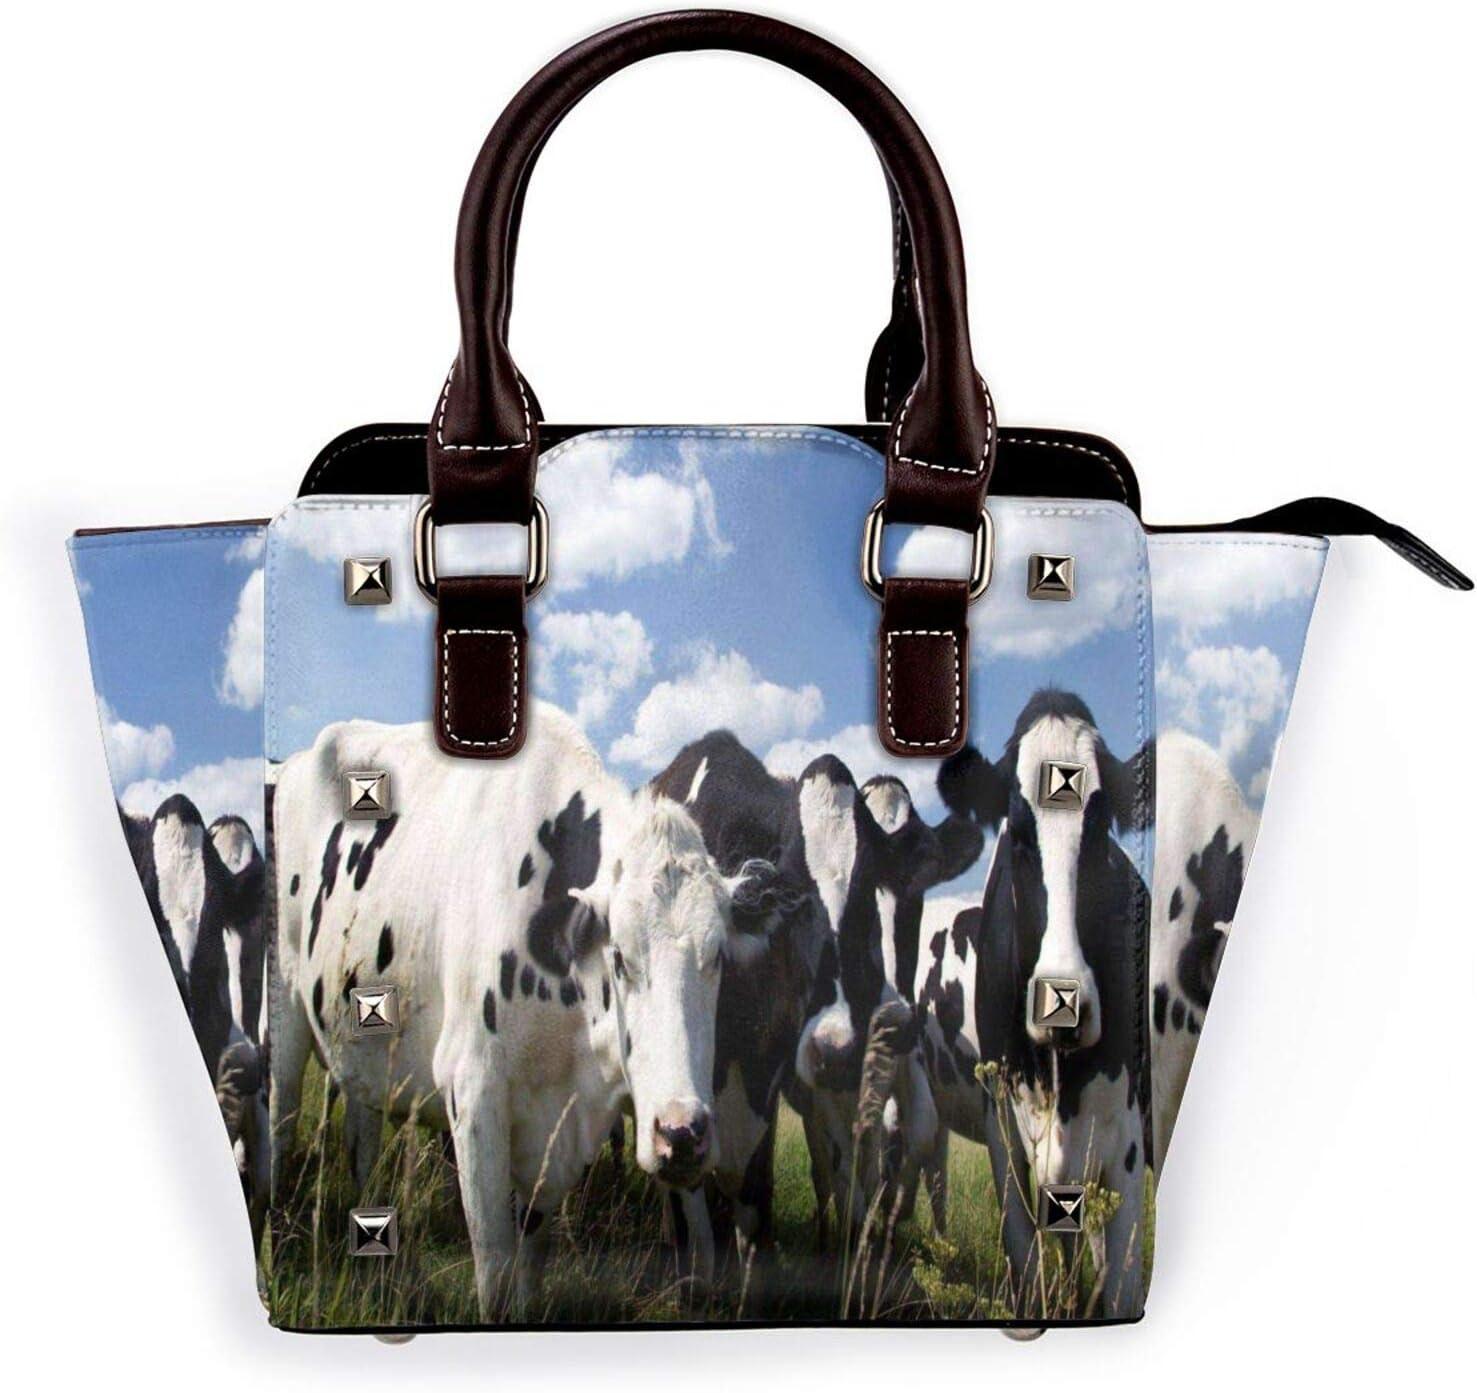 Tote Bag Farm Cows Blue Sky Handbags Max Now on sale 66% OFF Space Large Shoulder Ri